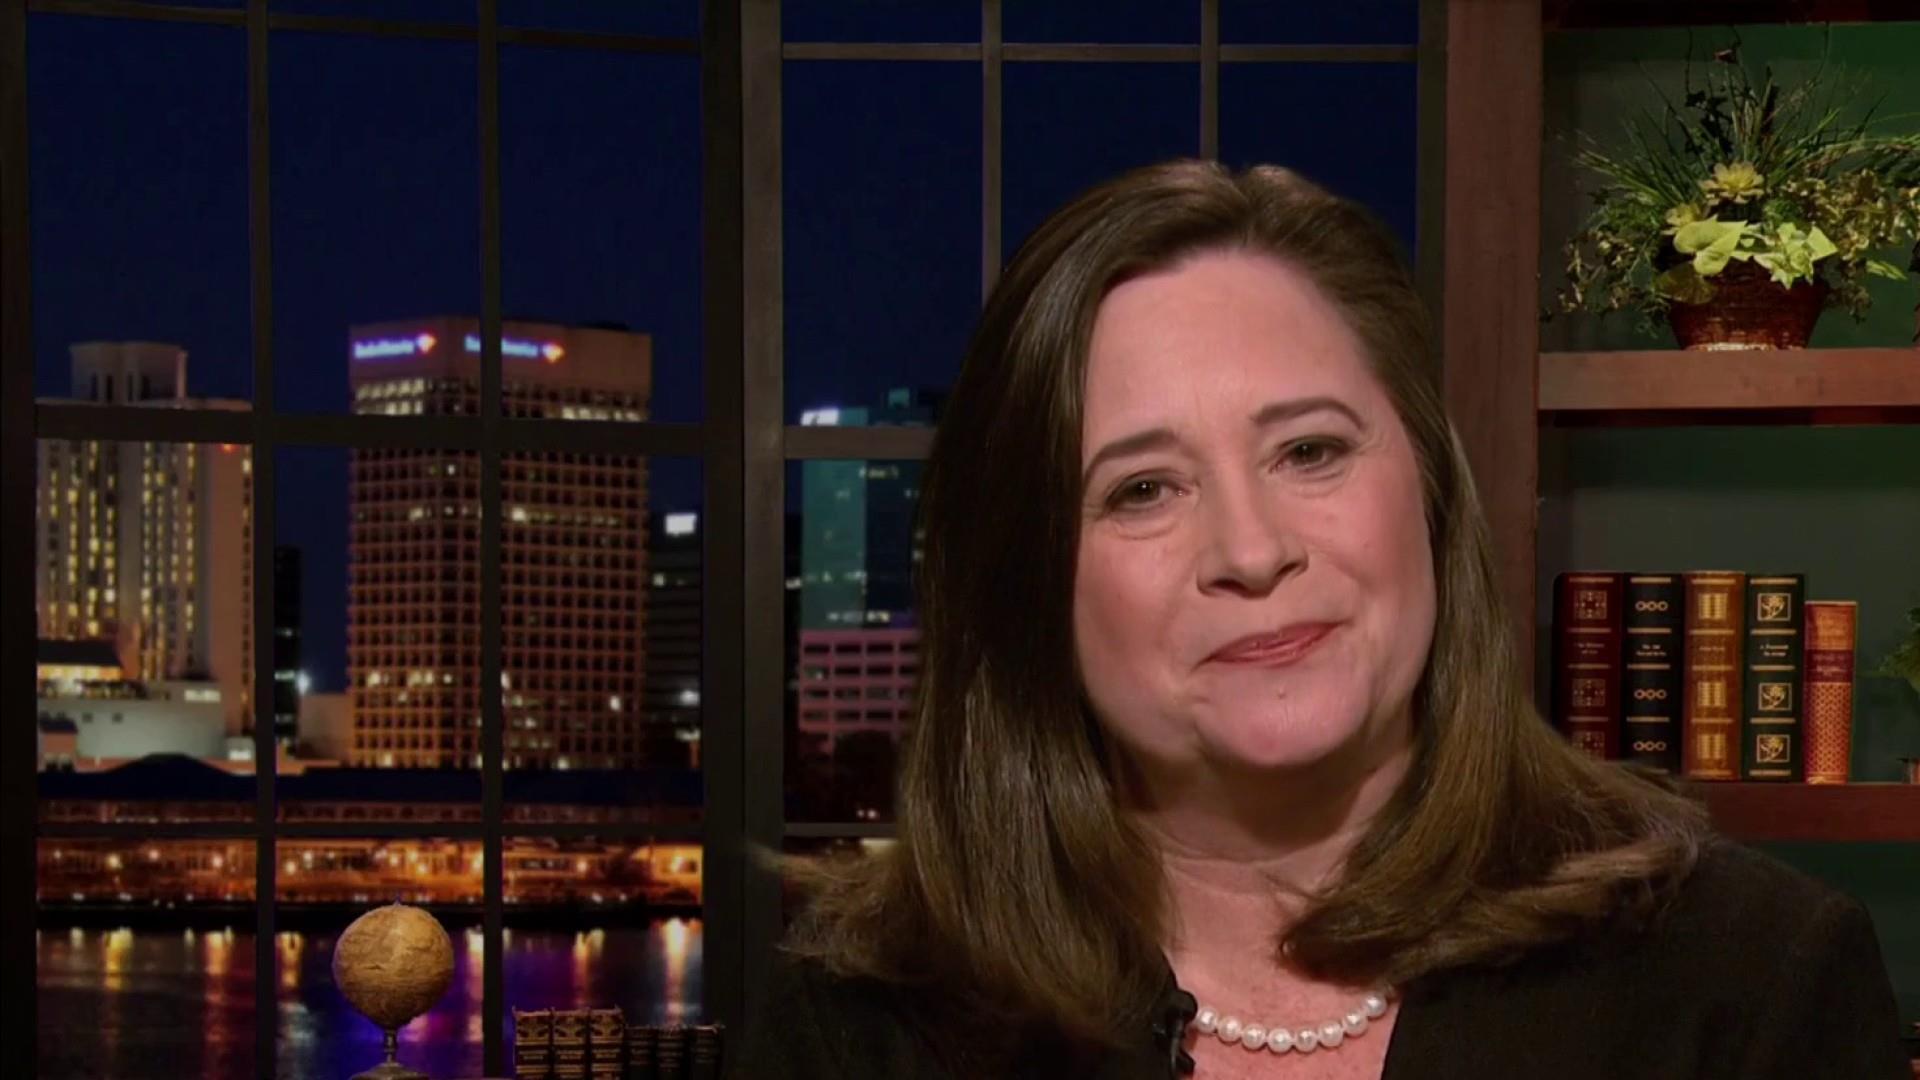 Virginia Democrat reacts to historic single-vote win